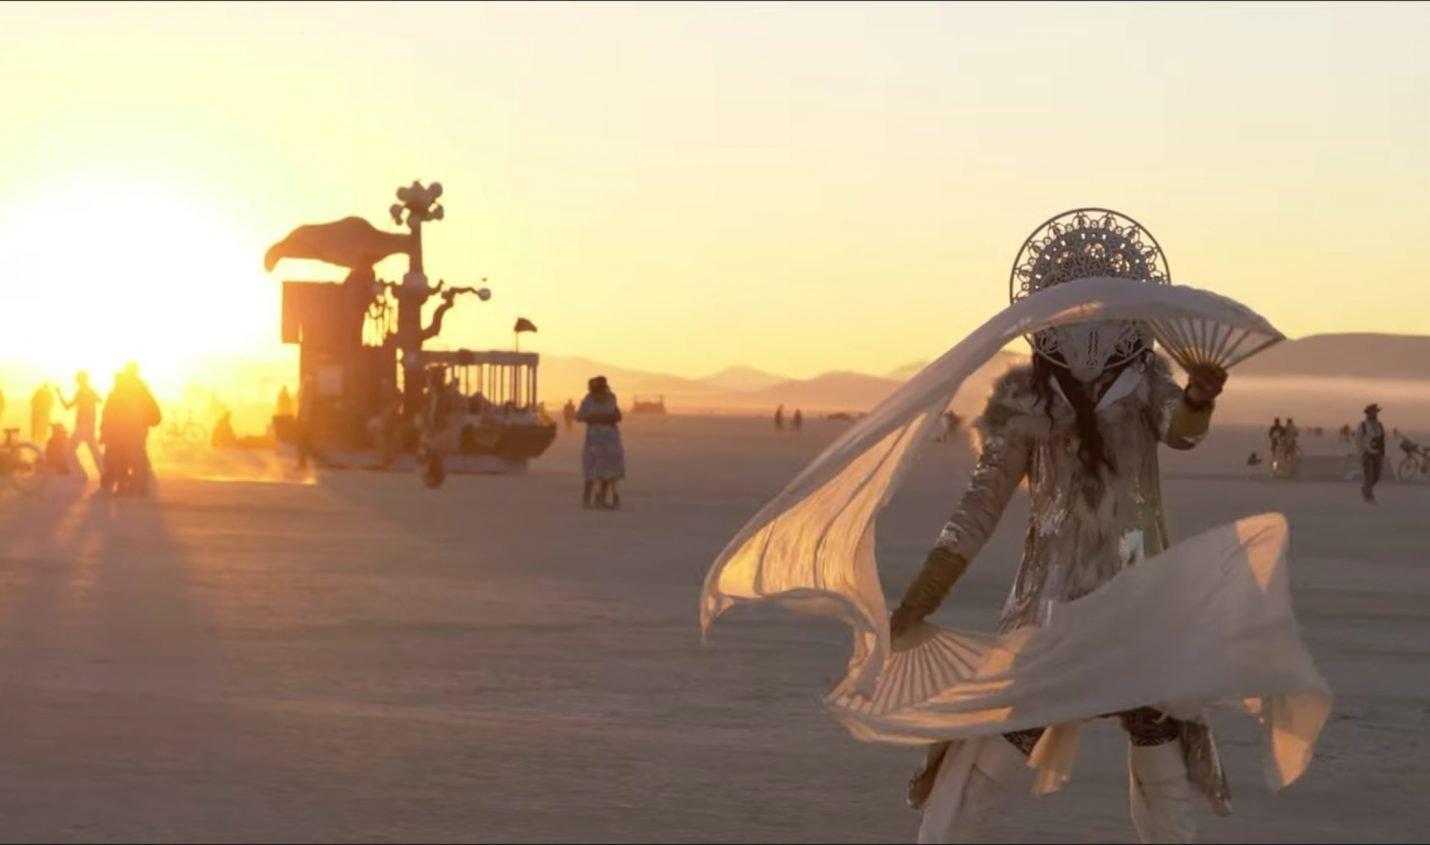 'Burning Man: Art on Fire' Dokumentation über das berühmte Festival